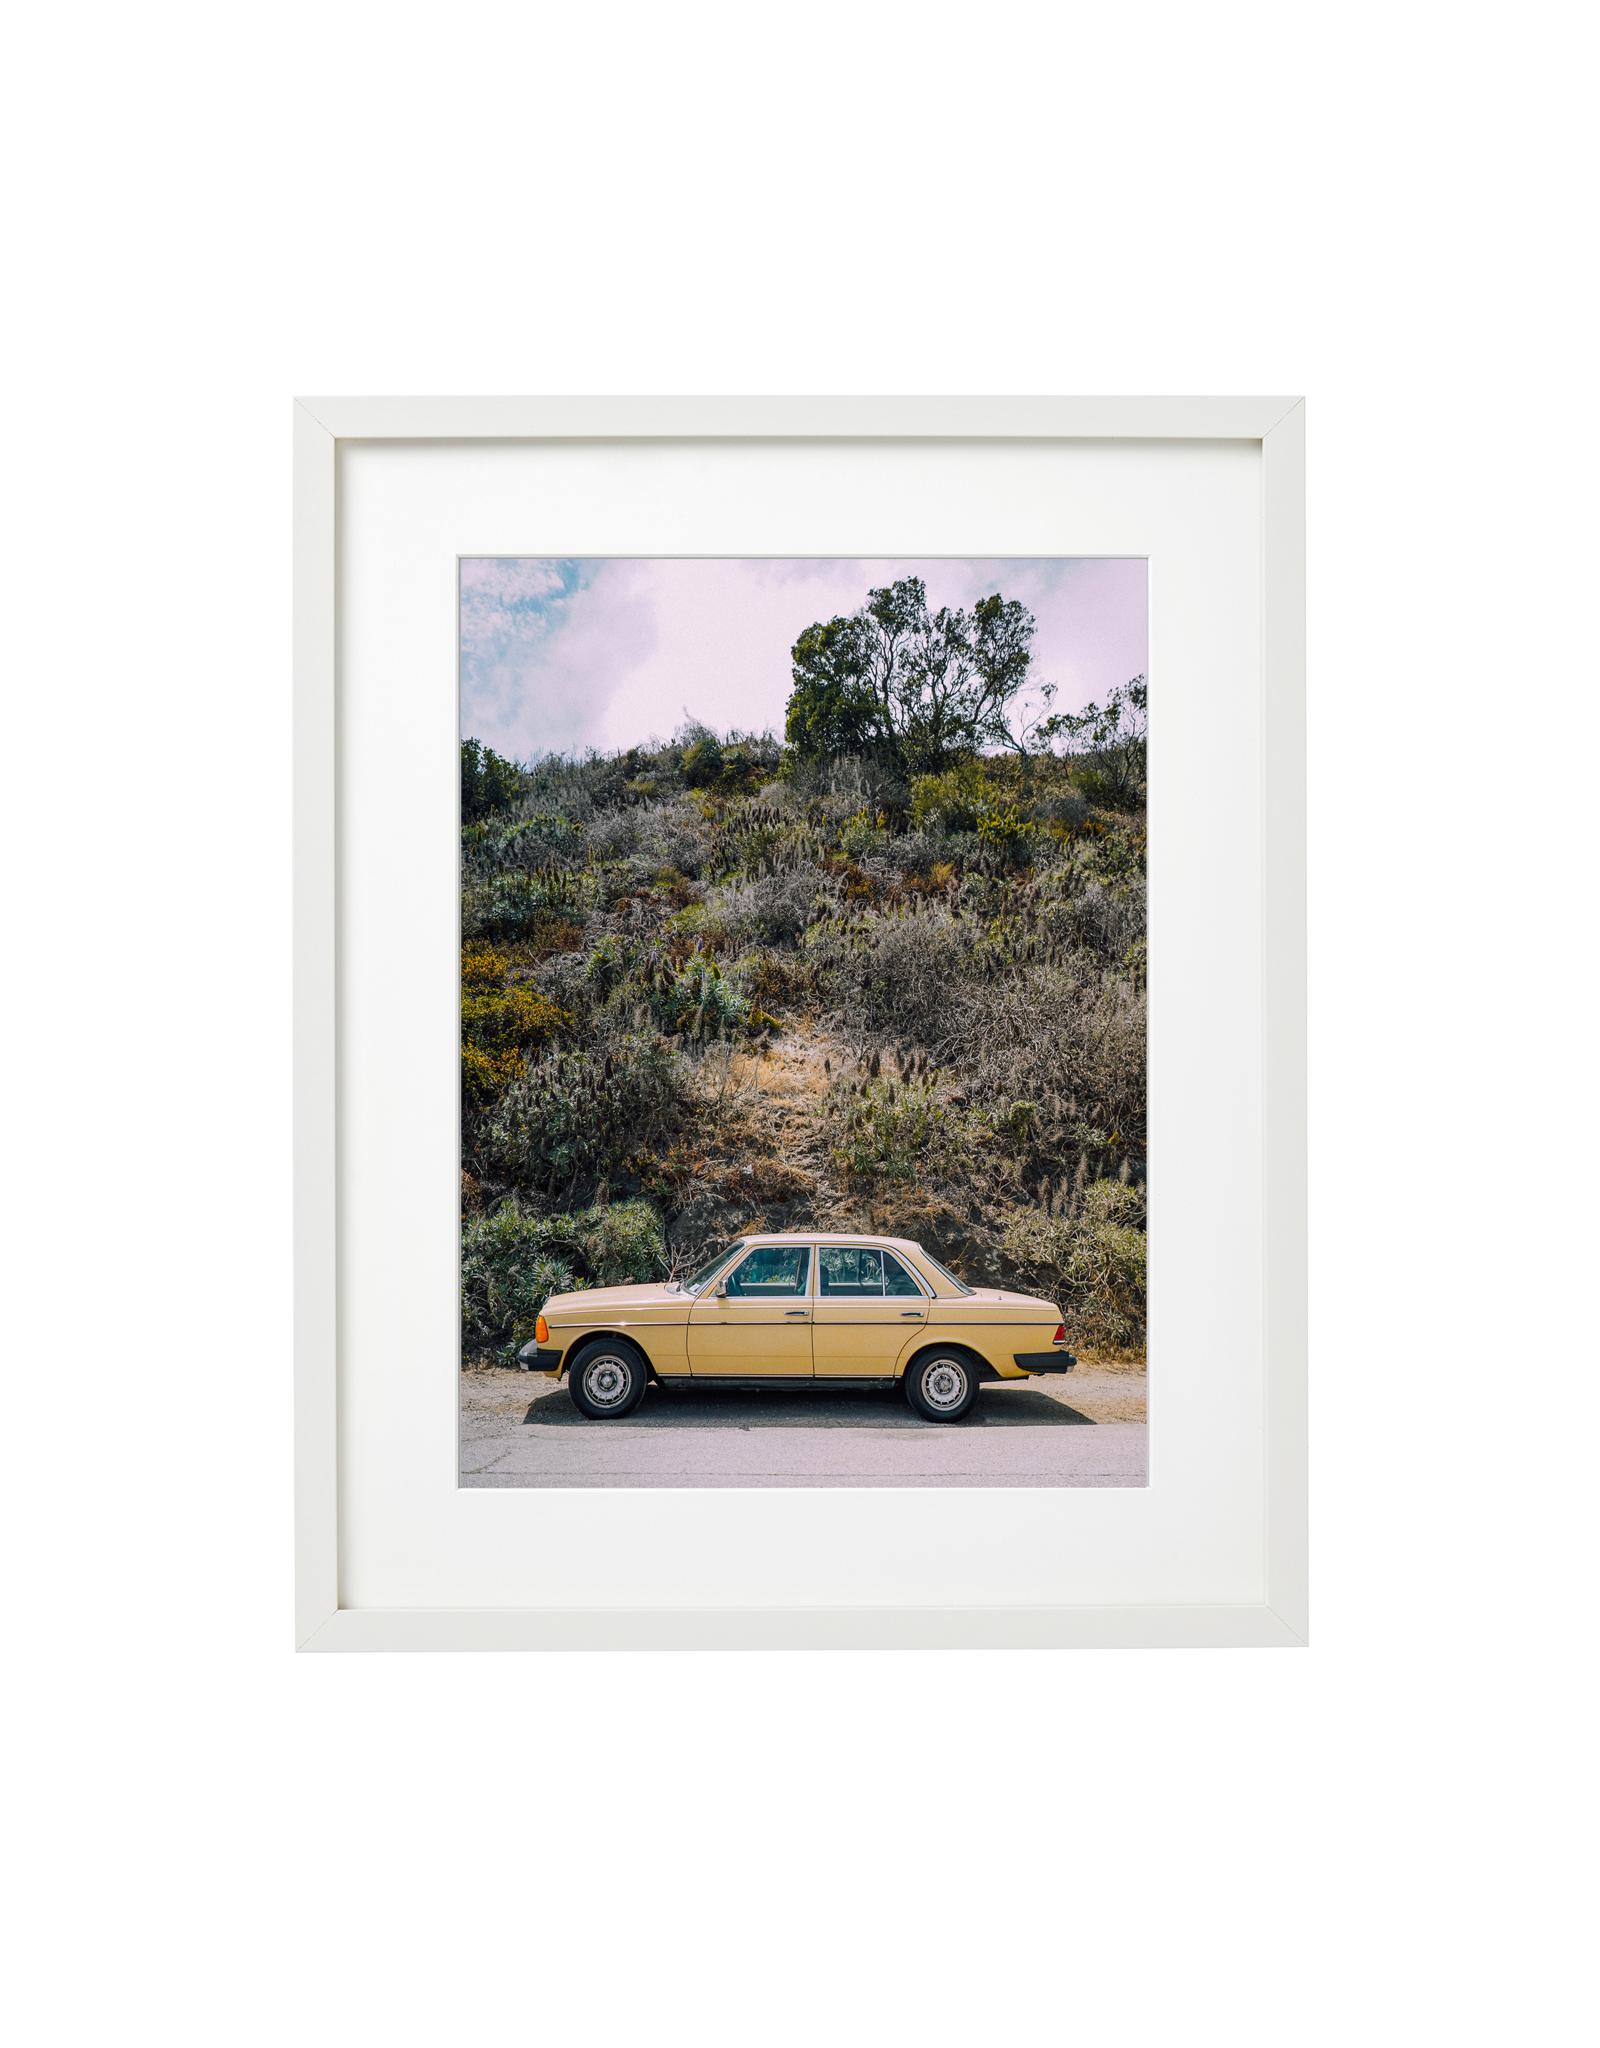 California Gold - Félix Patenaude